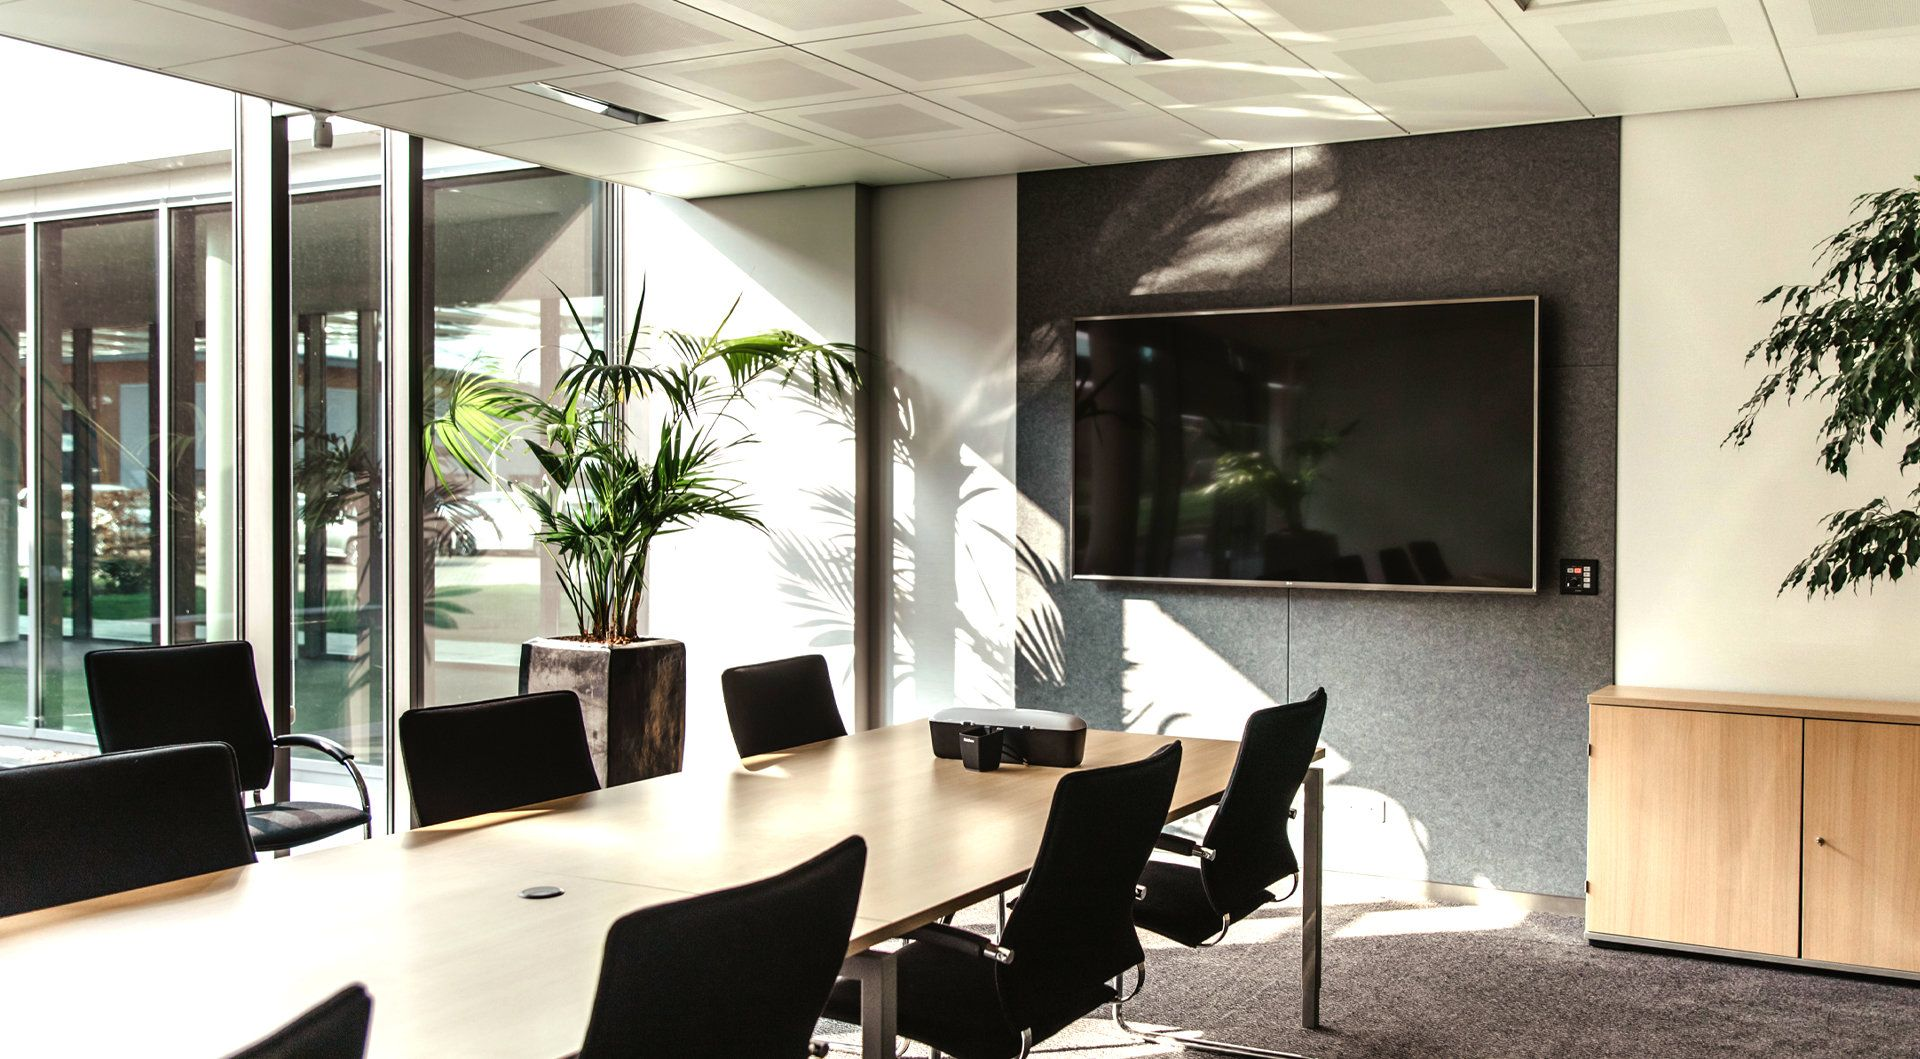 "Dekker Industrial Design DID020.001.001-02 flat panel vloer standaard 81,3 cm (32"") Vaste flatscreen vloerstandaard Zwart - Case studie de vries"